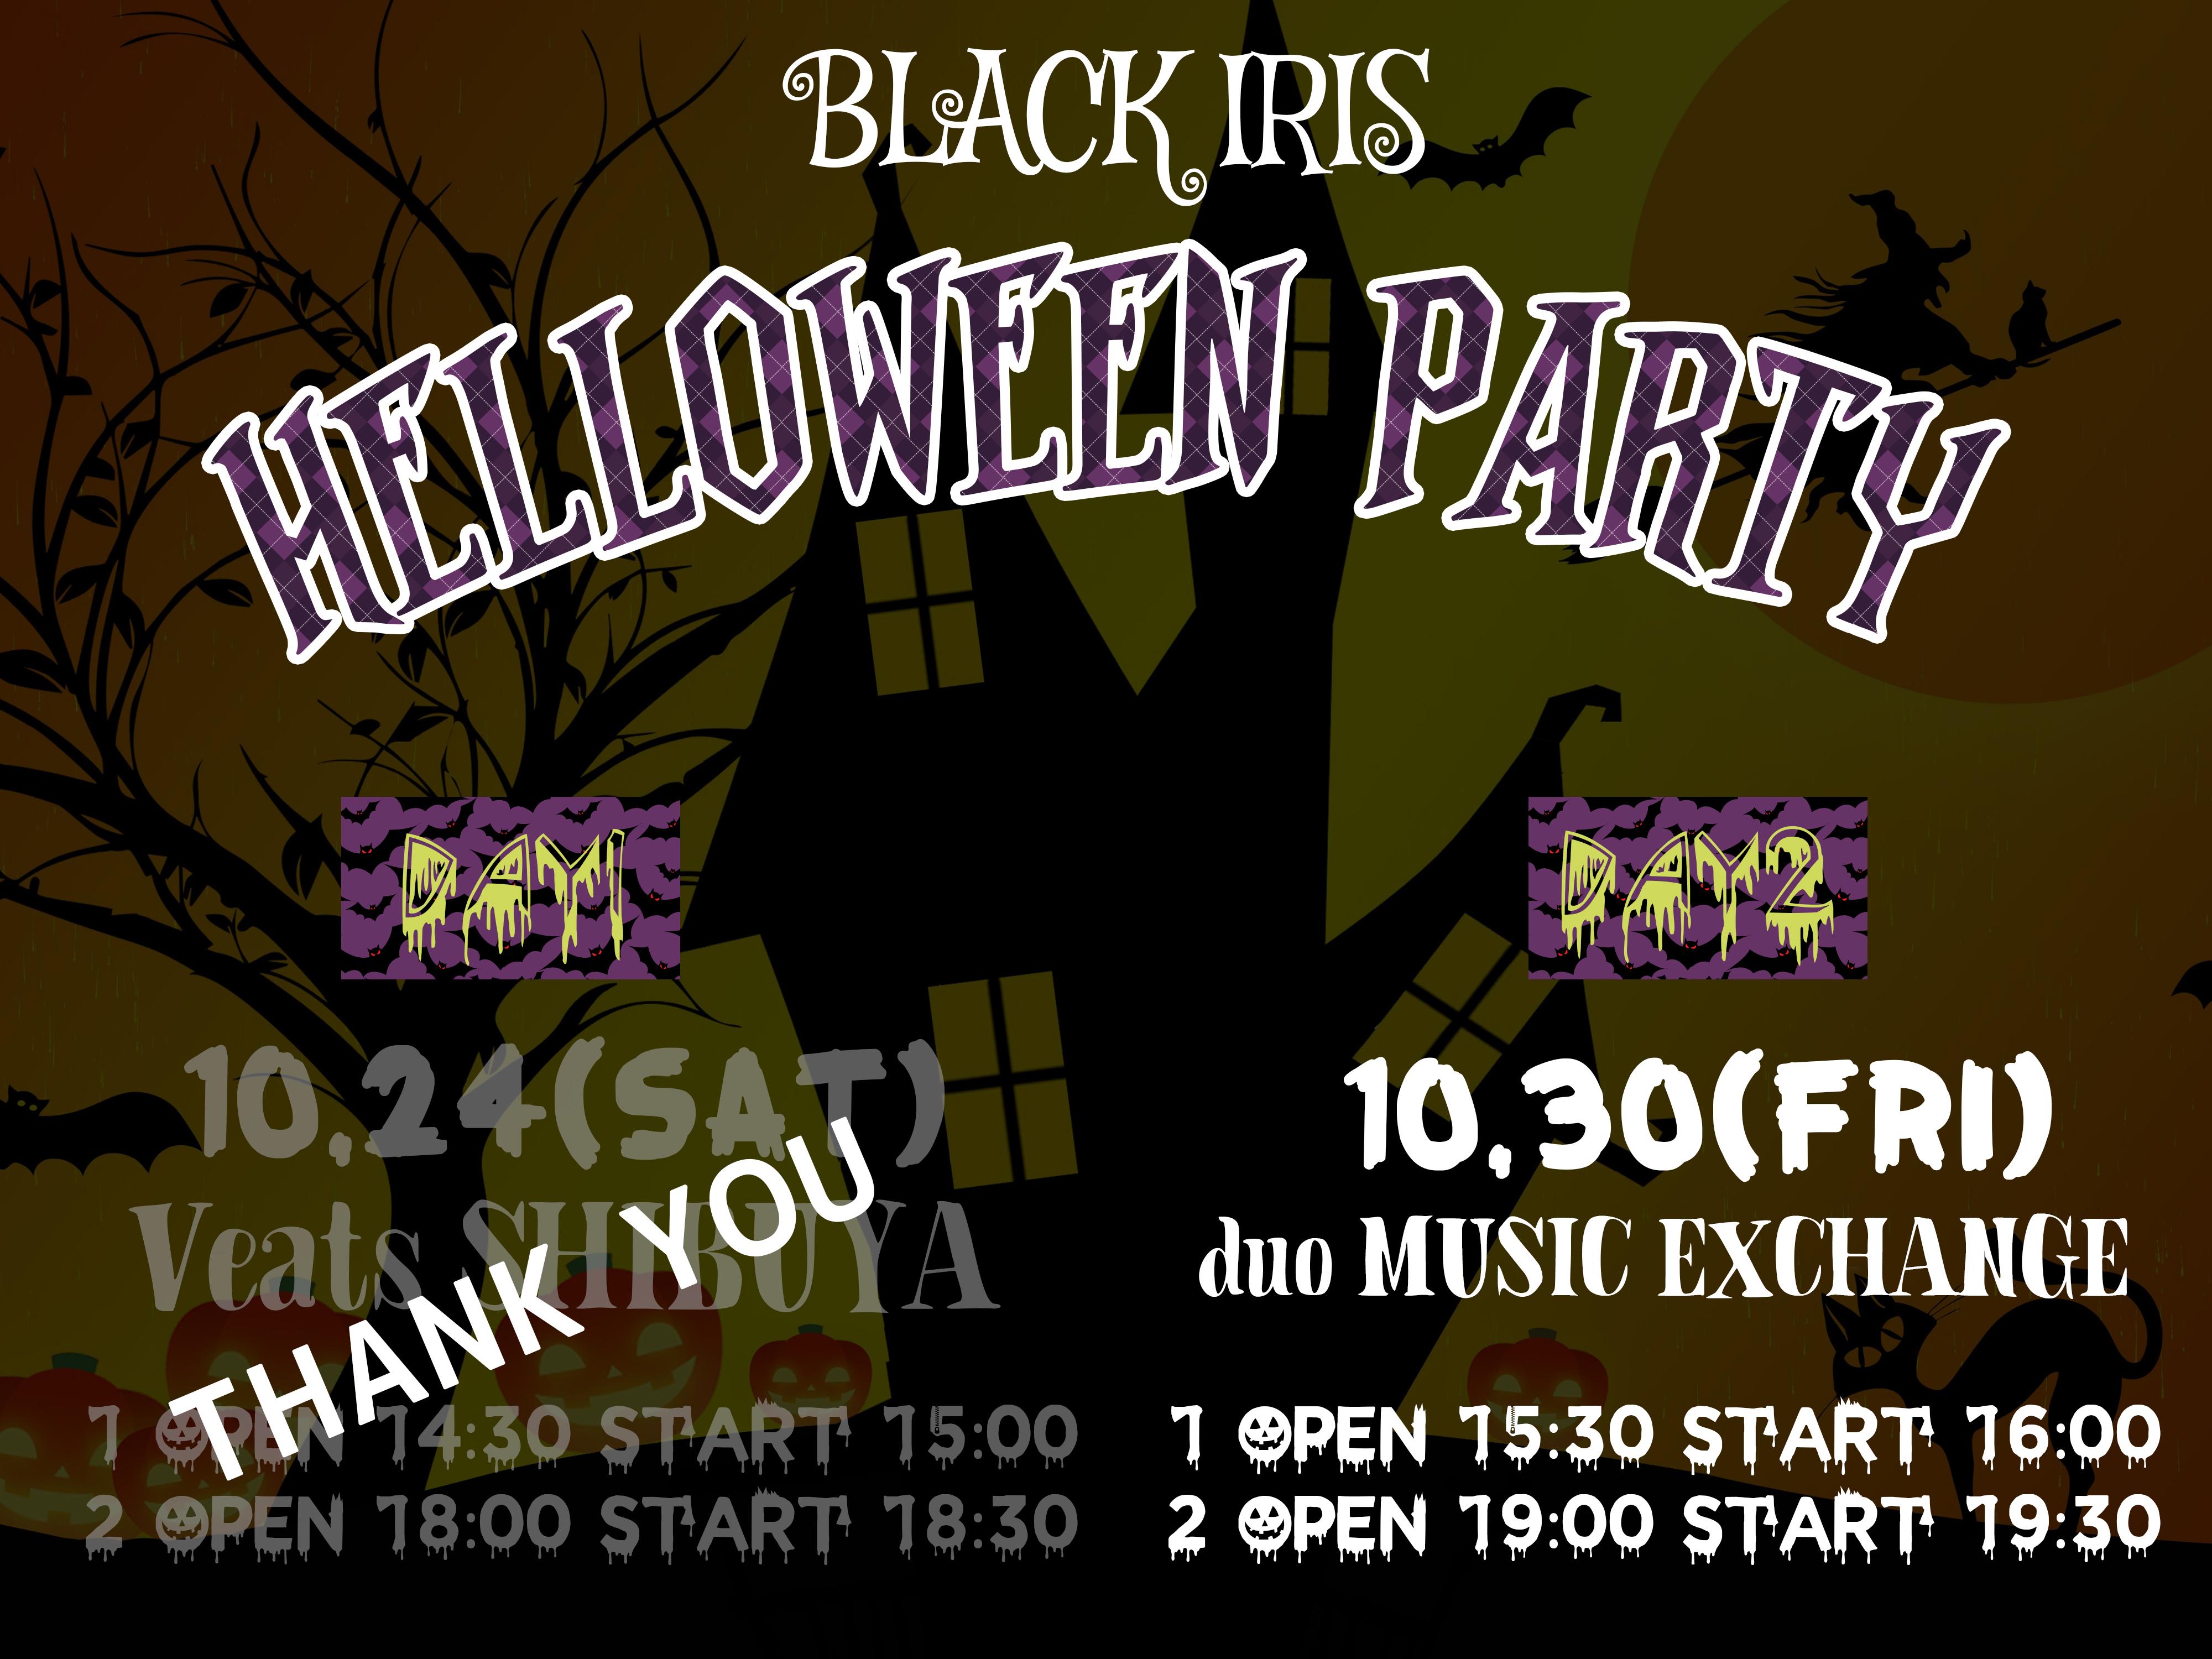 BLACK IRIS HELLOWEEN PARTY day2